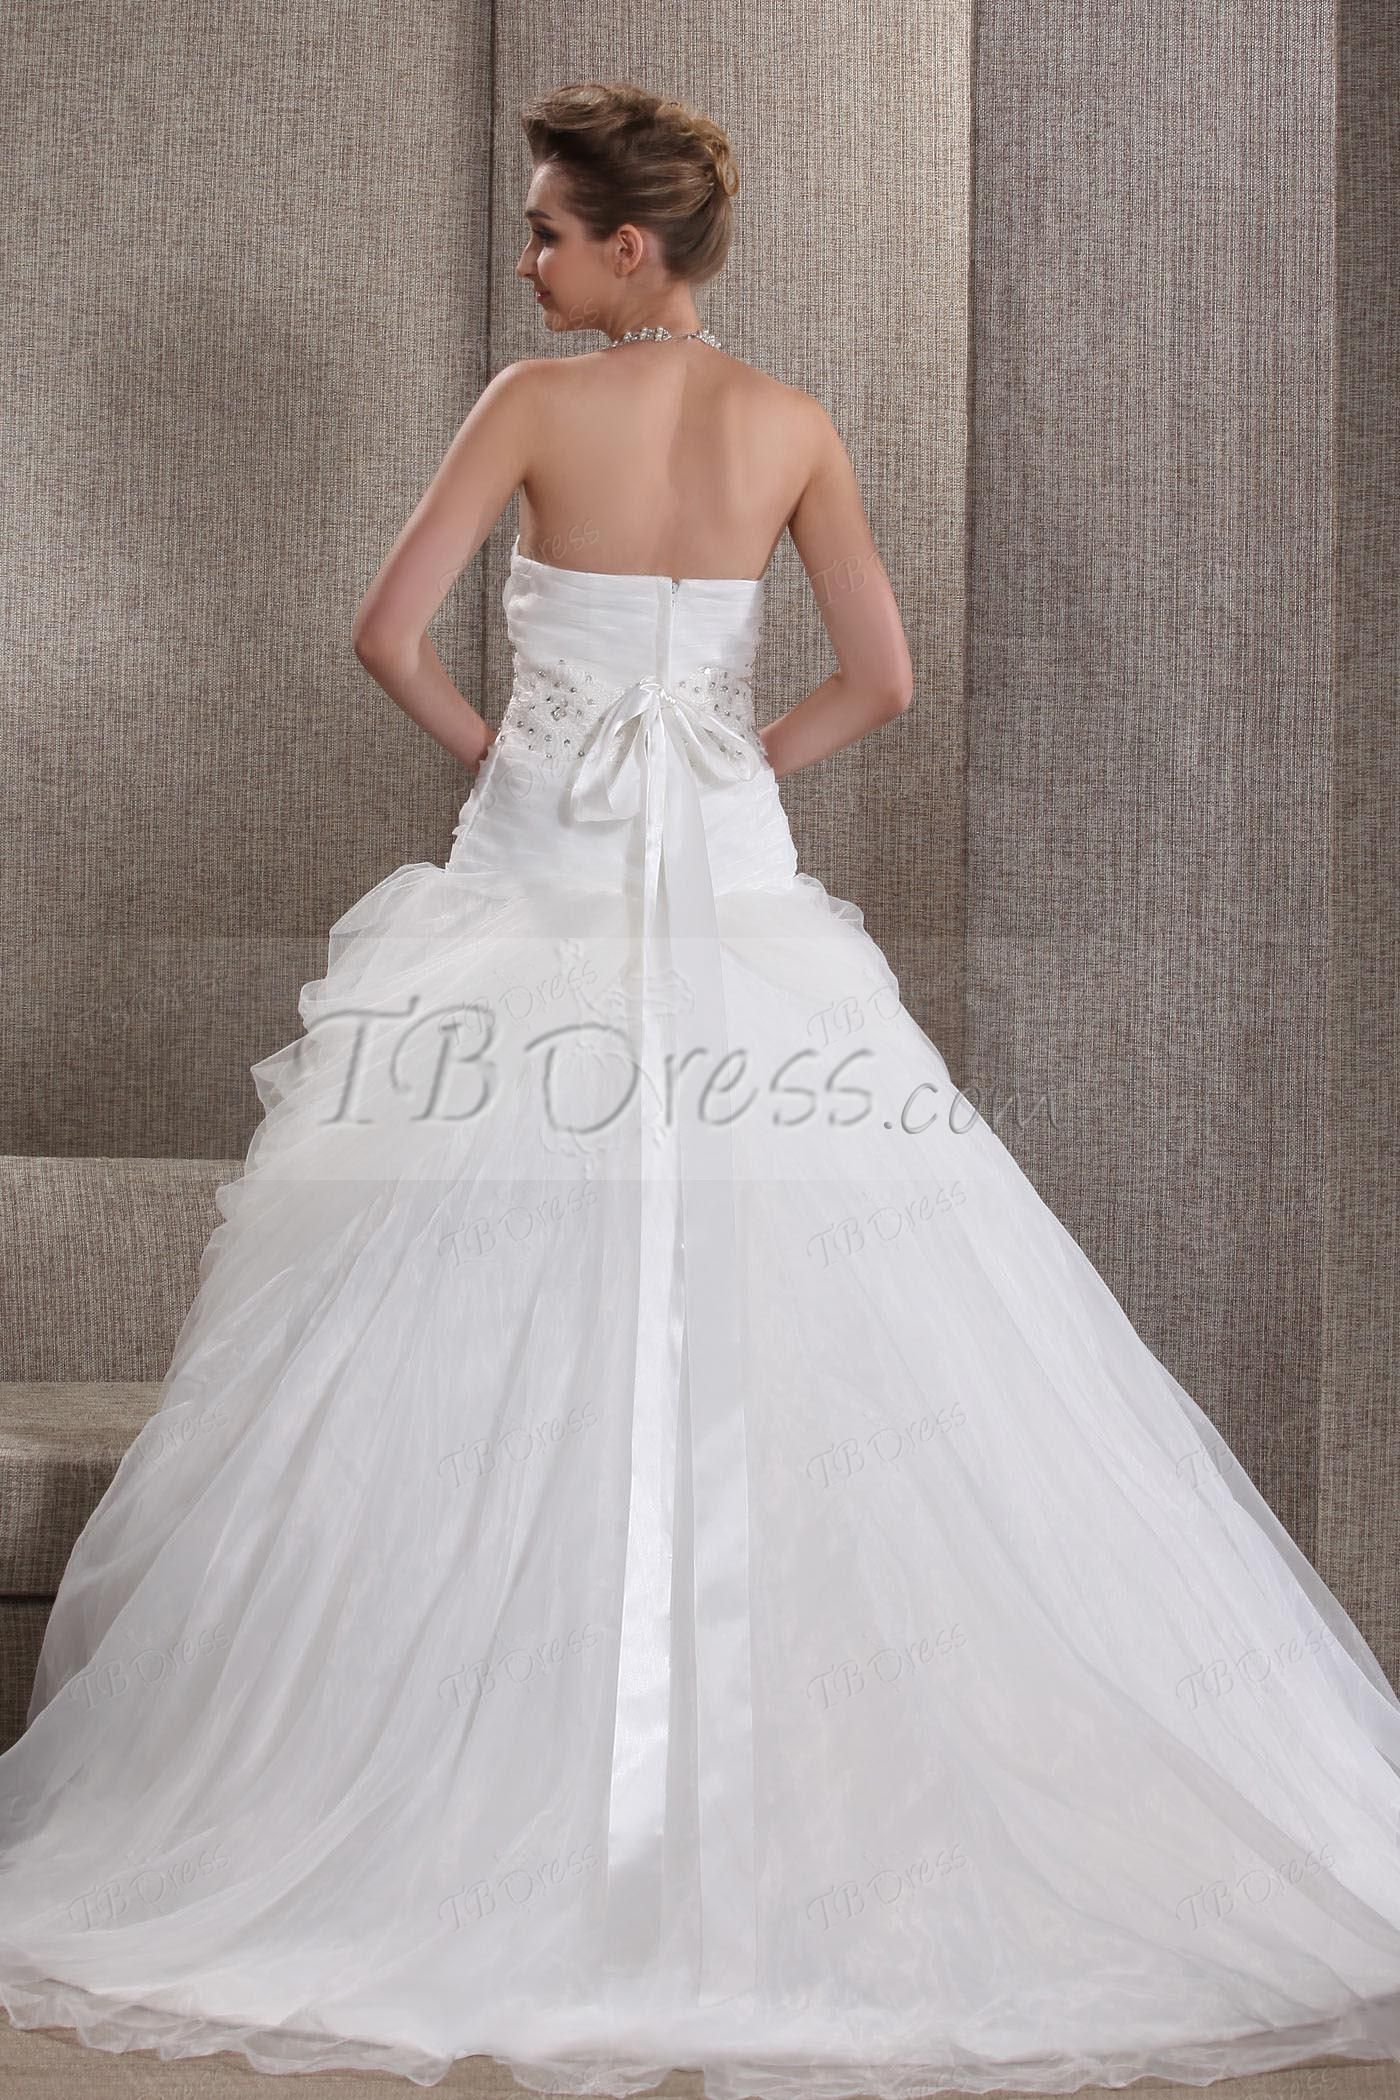 Fabulous A-line Sweetheart Floor-Length Court Pick-up Angerlika's Wedding Dress